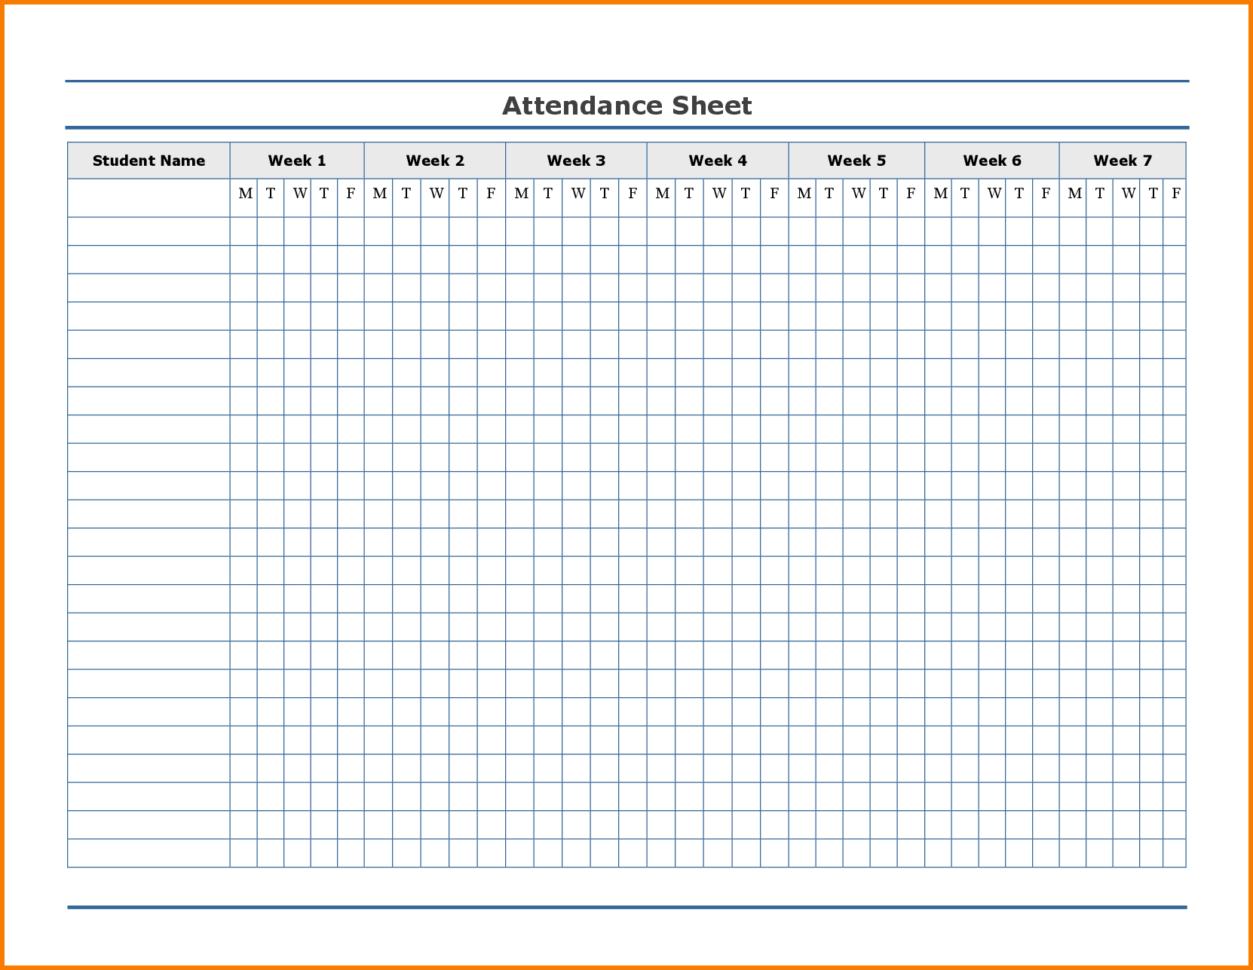 Free Employee Attendance Tracking Spreadsheet For Free Employee Attendance Calendar  Employee Tracker Templates 2019